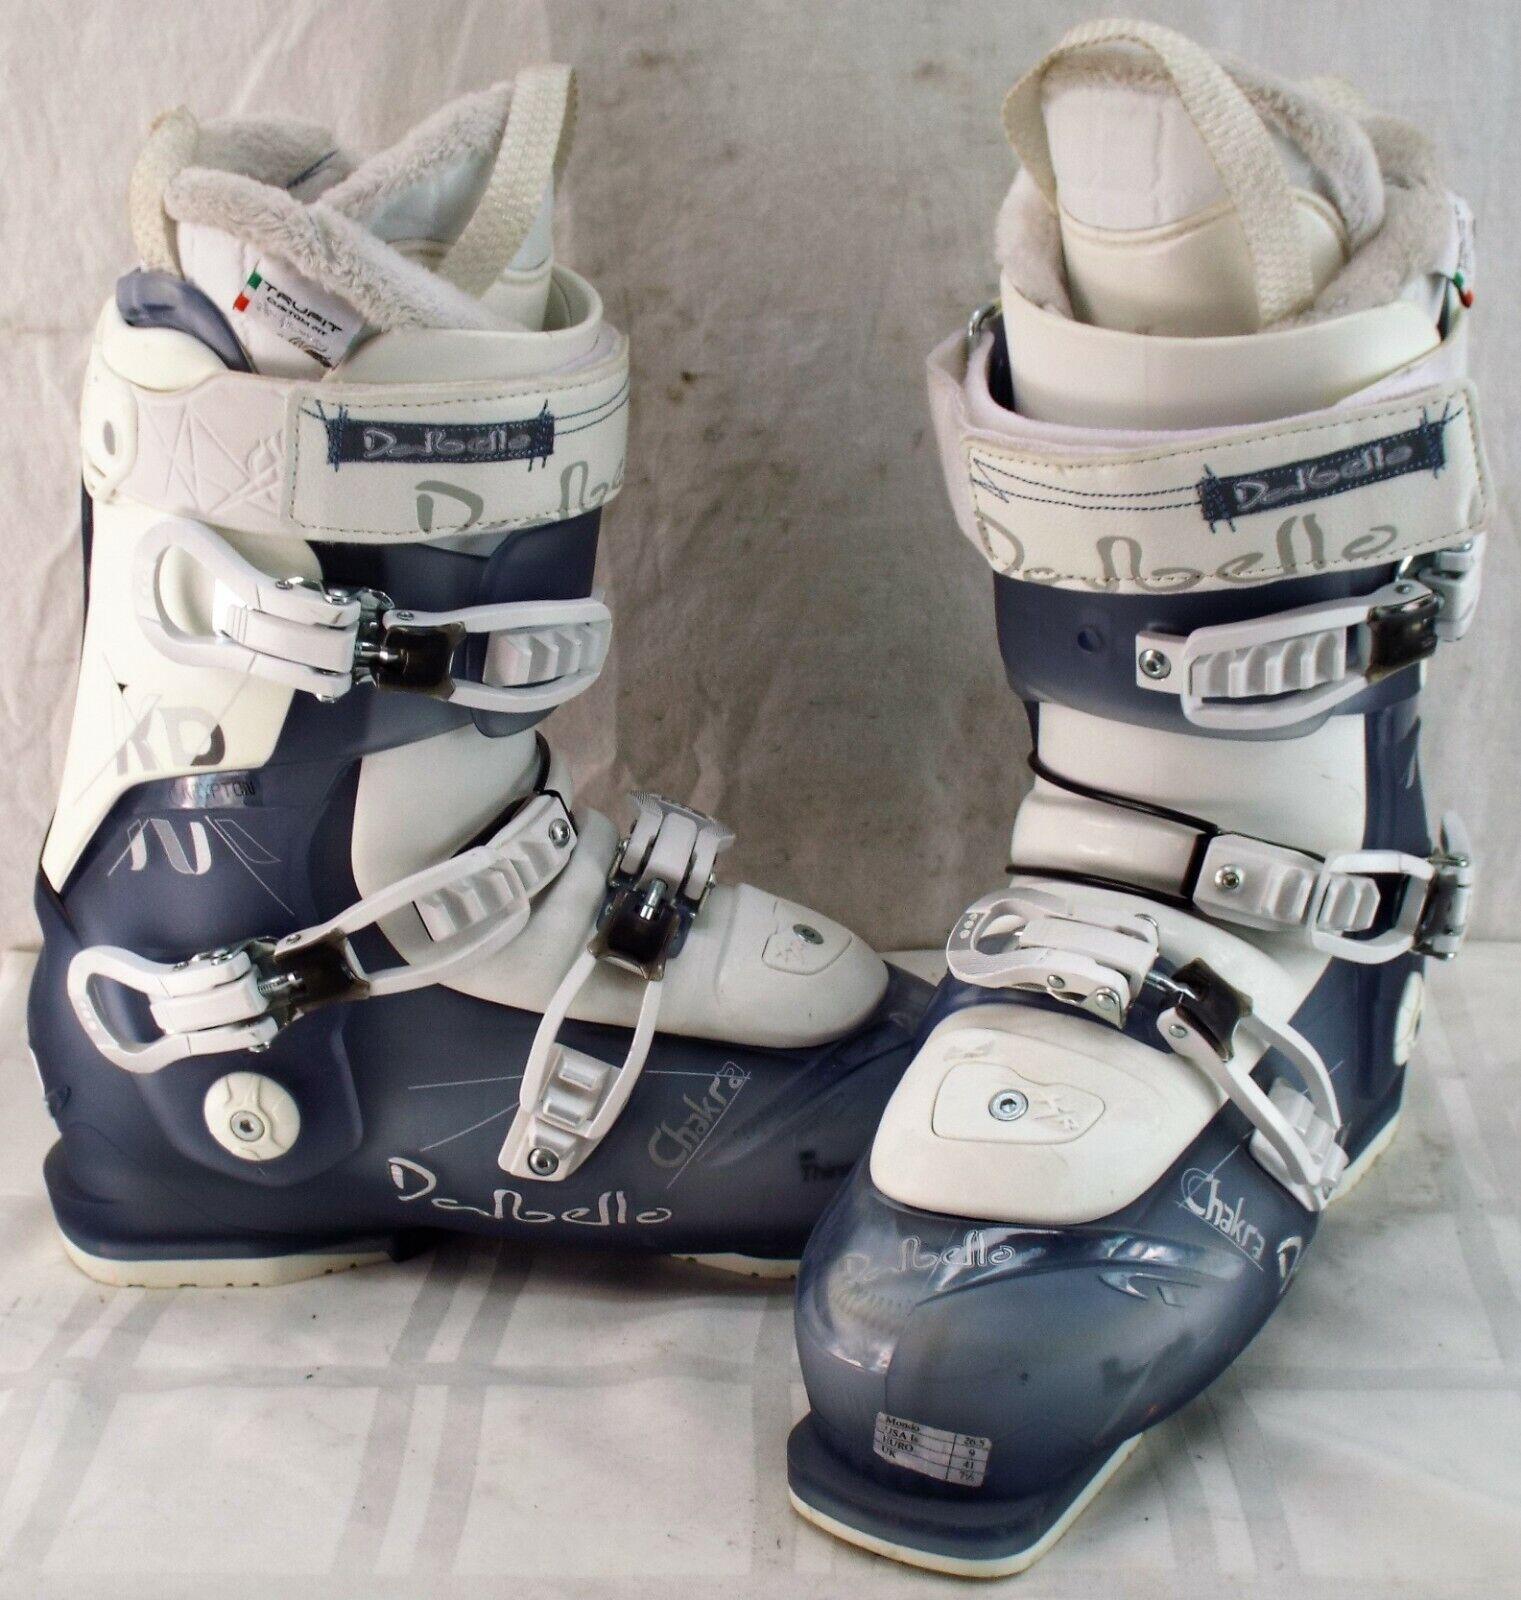 Dalbello Krypton Chakra New Women's Ski  Boots Size 26.5  online shopping sports